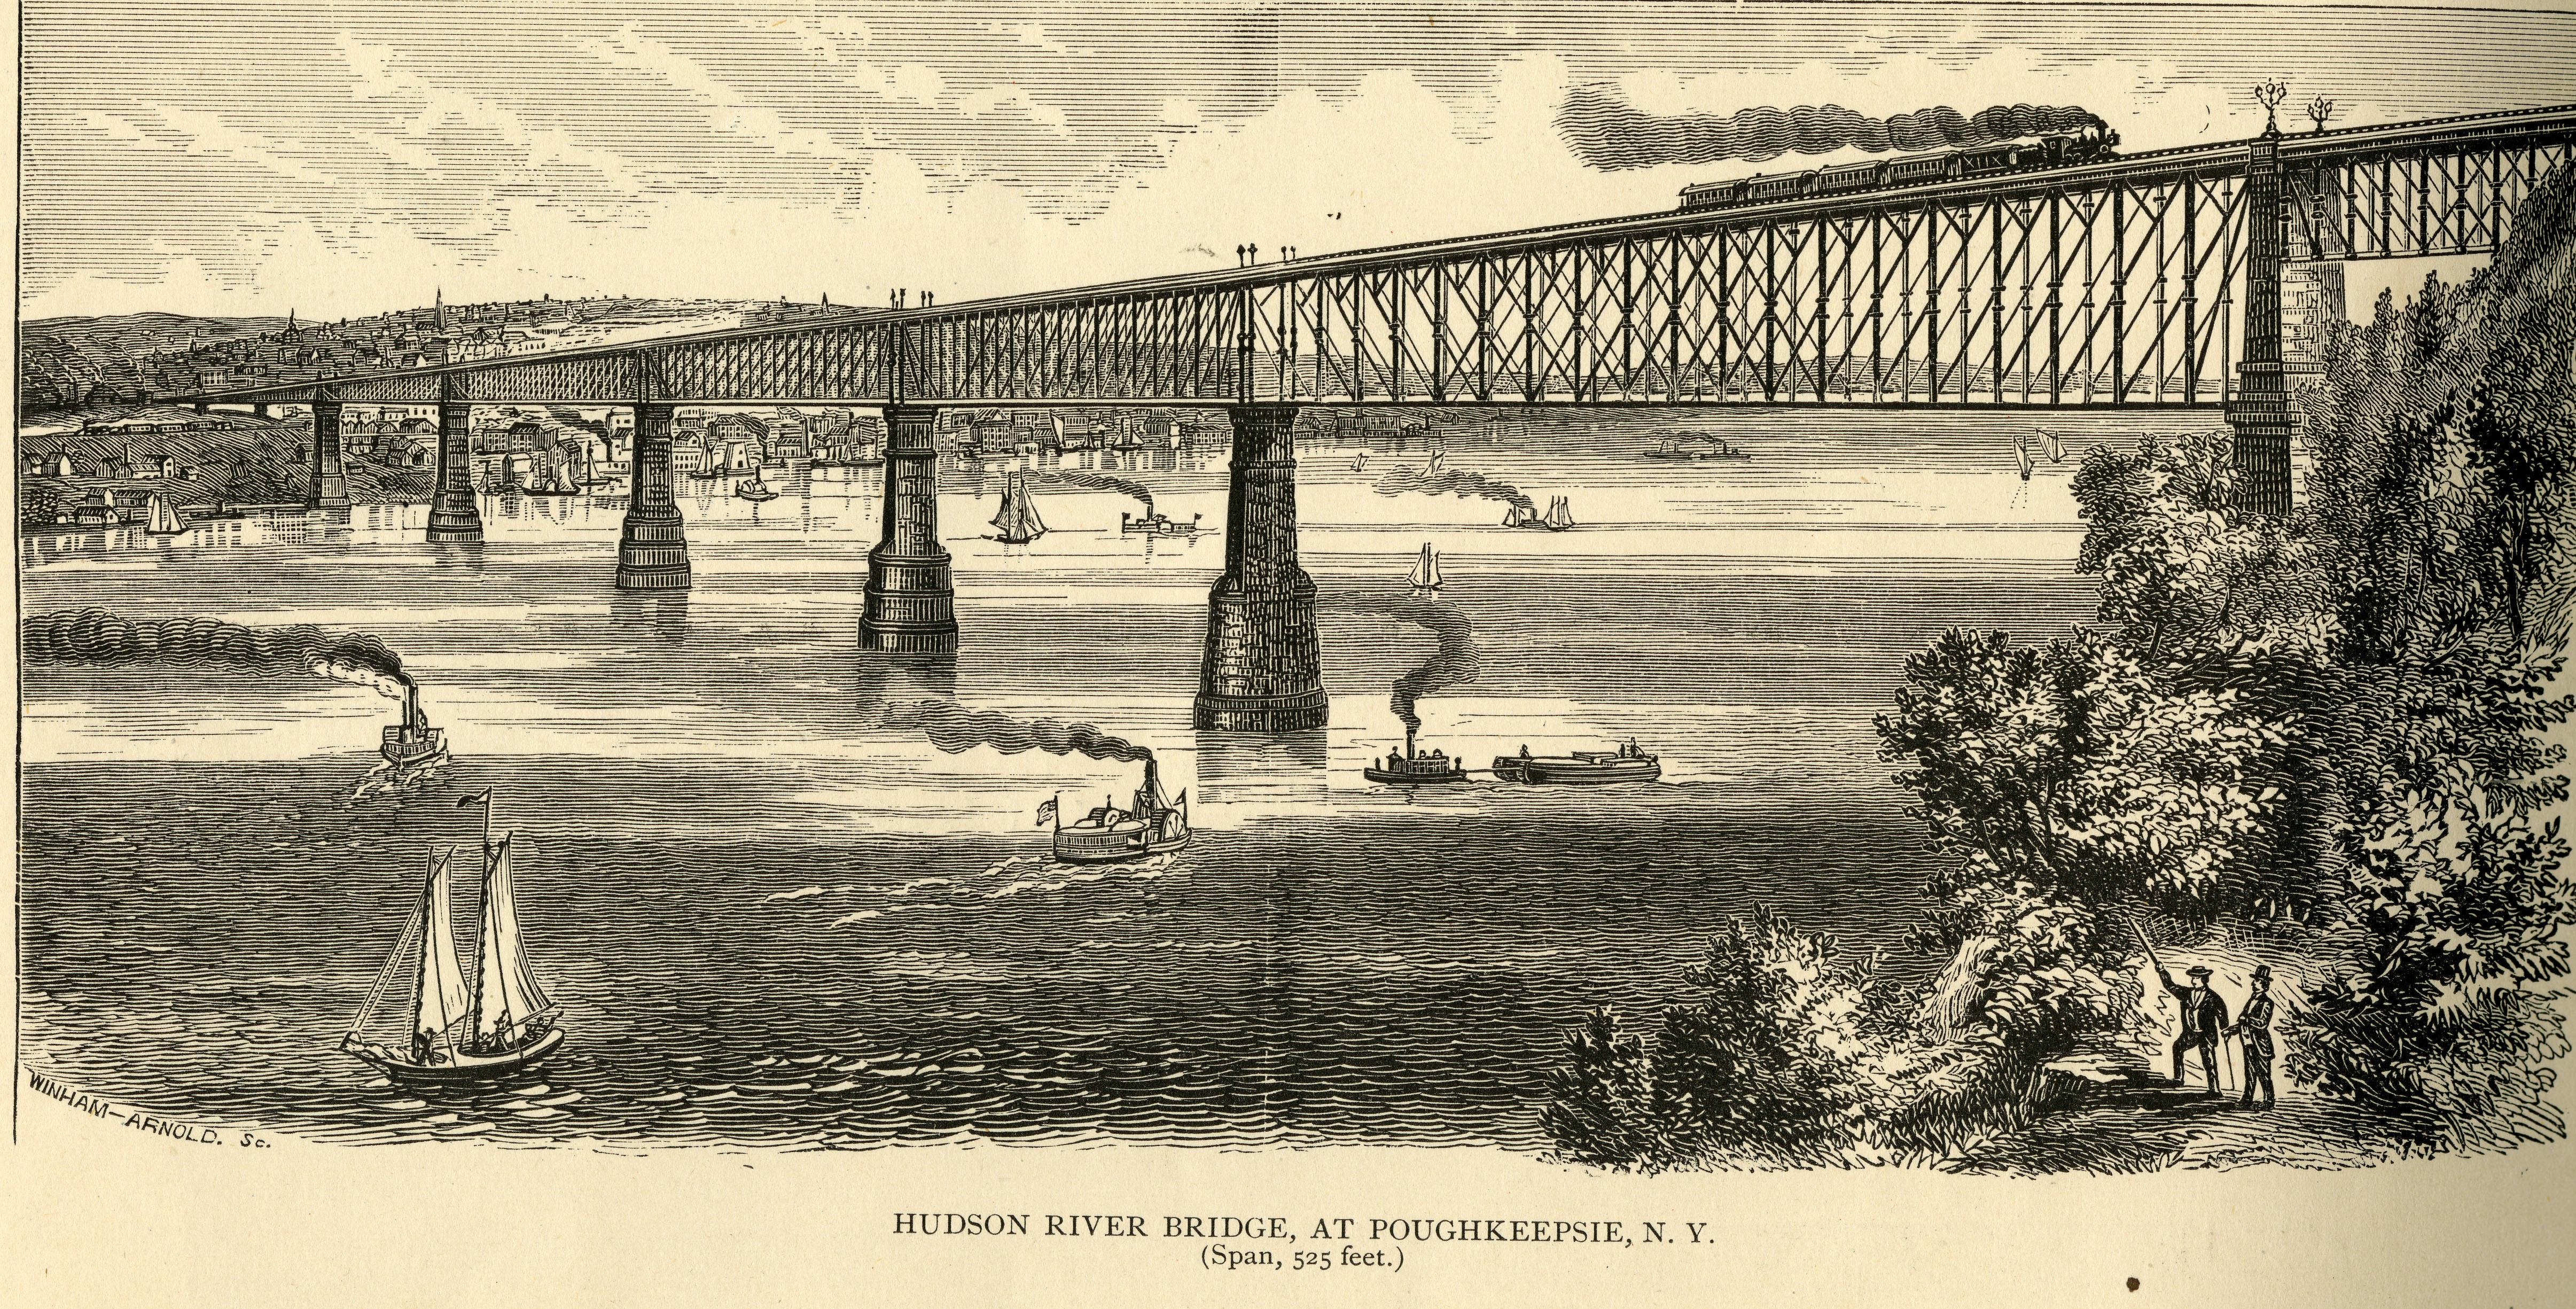 Illustration of Hudson River Bridge at Poughkeepsie, New York